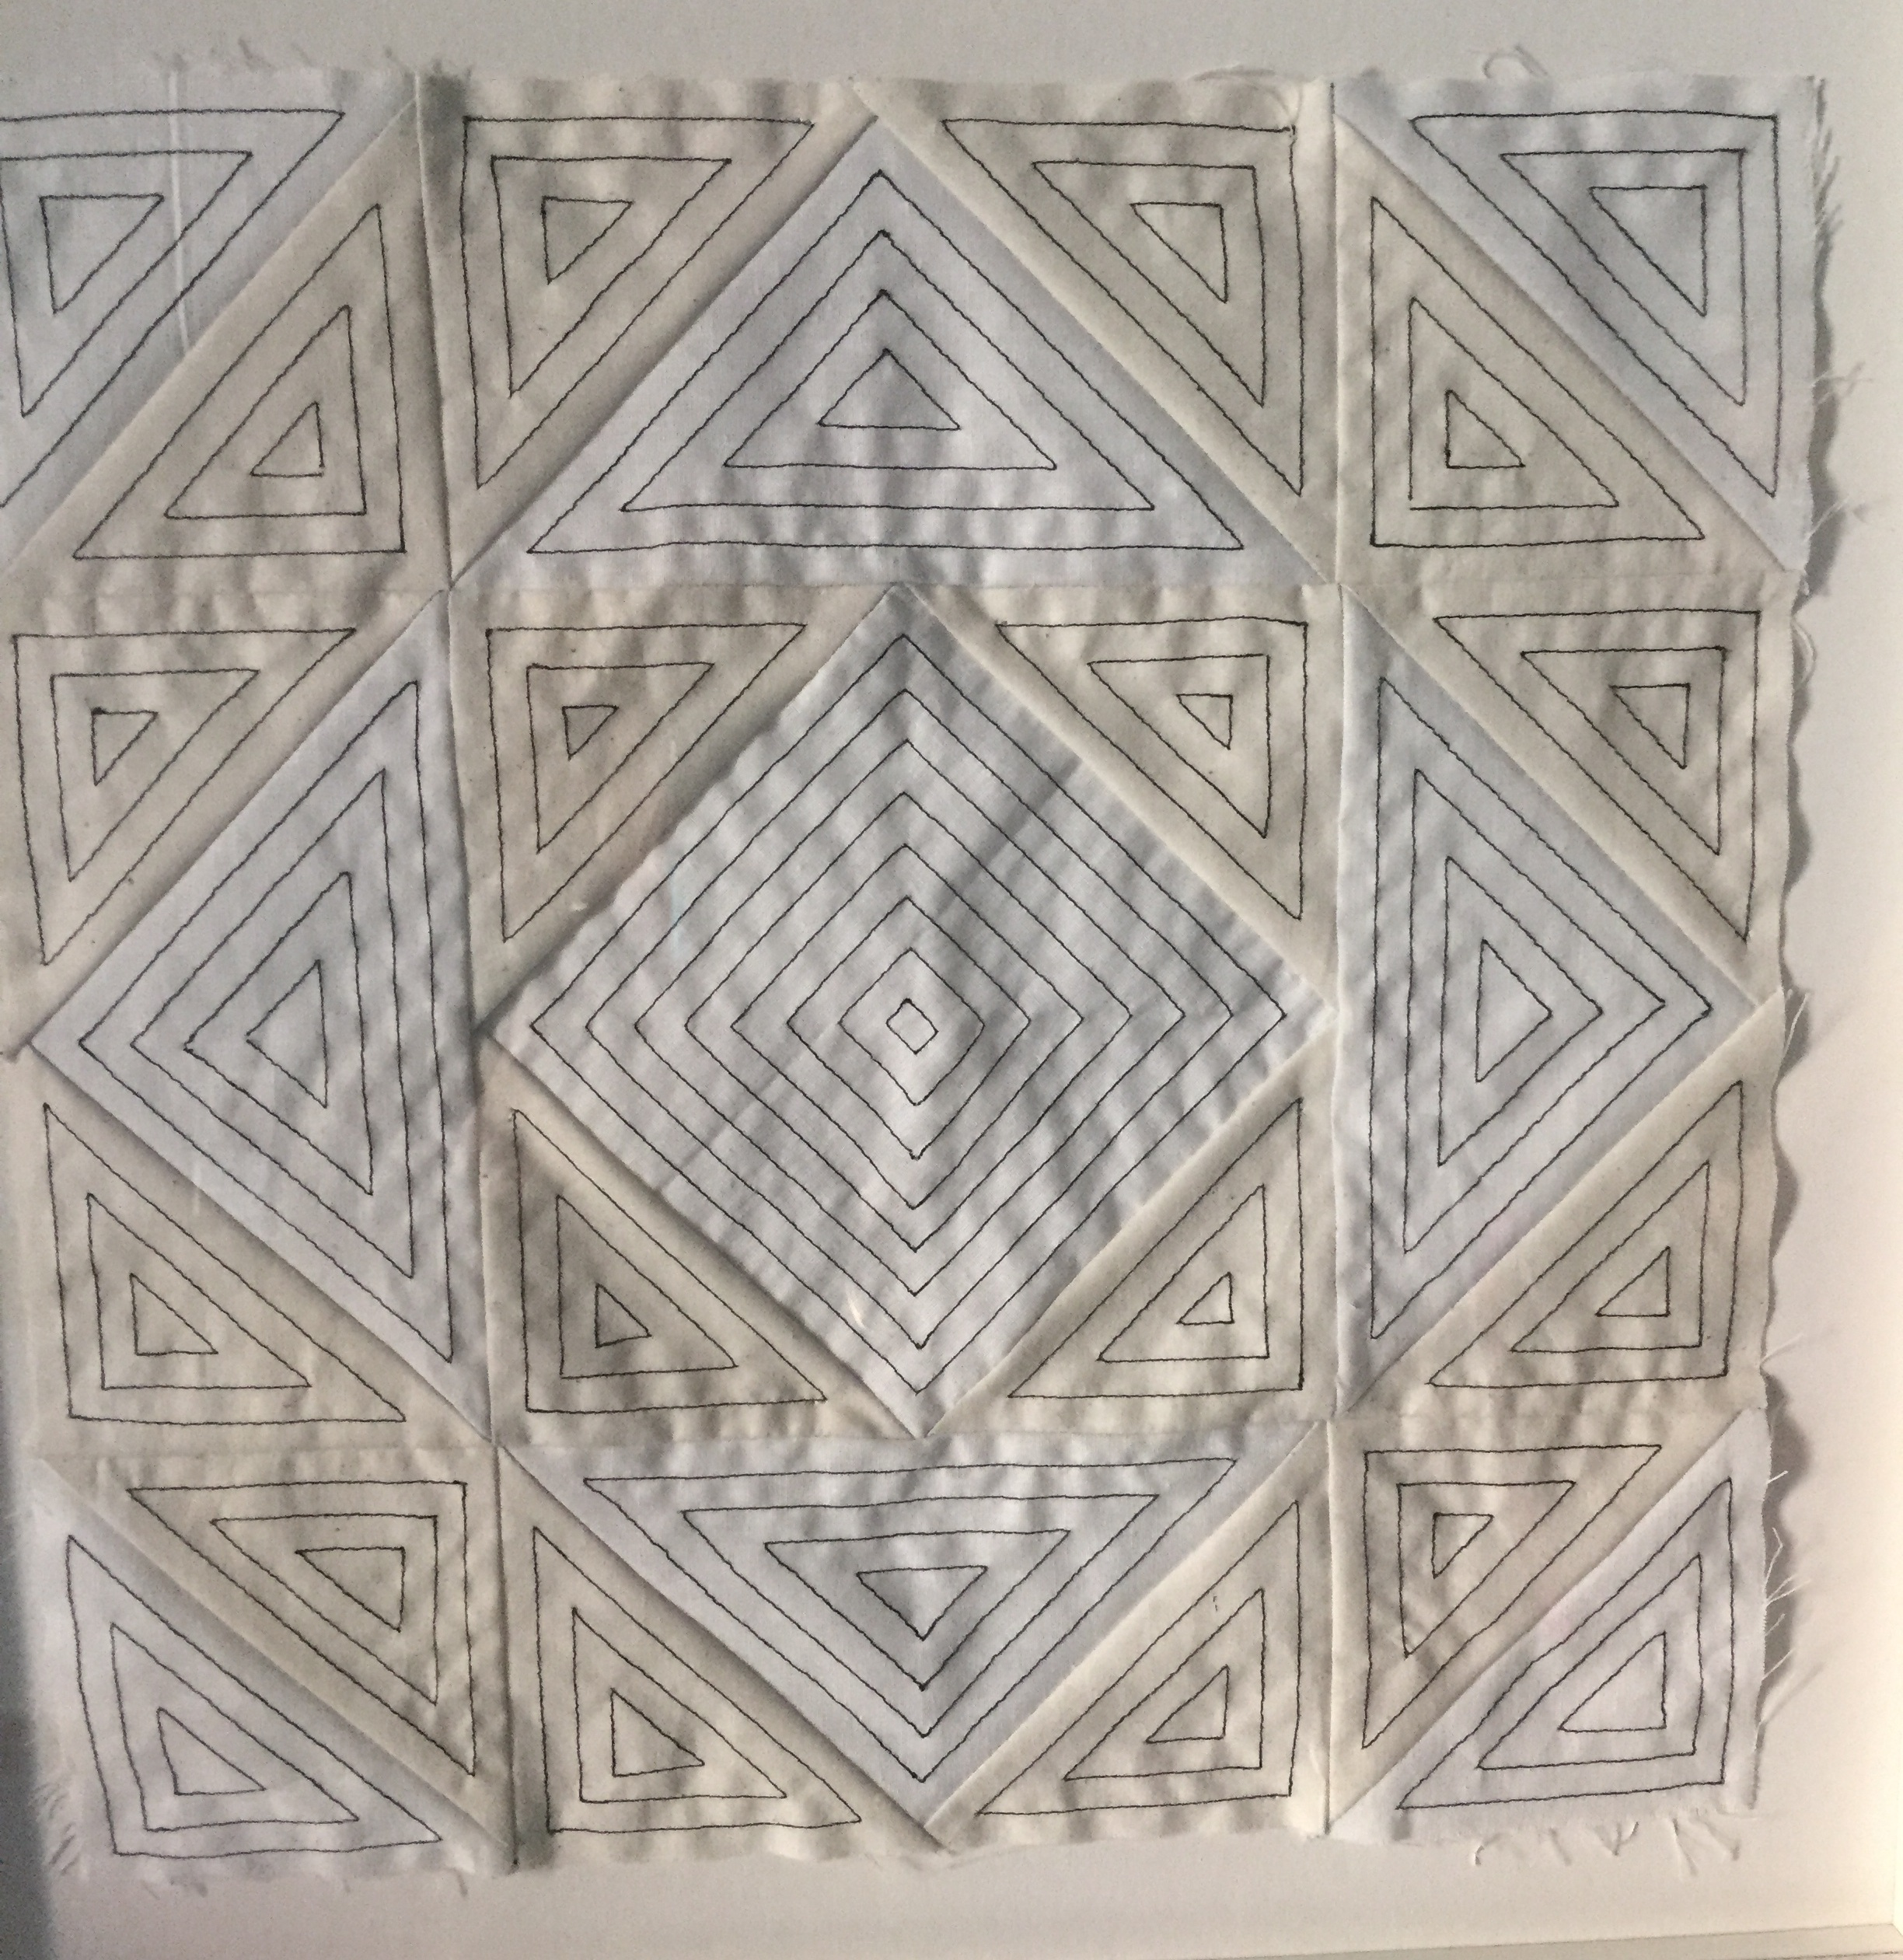 #77 Robert Hickman  4222 Study  Thread on fabric 15 x 15 in, framed 2016